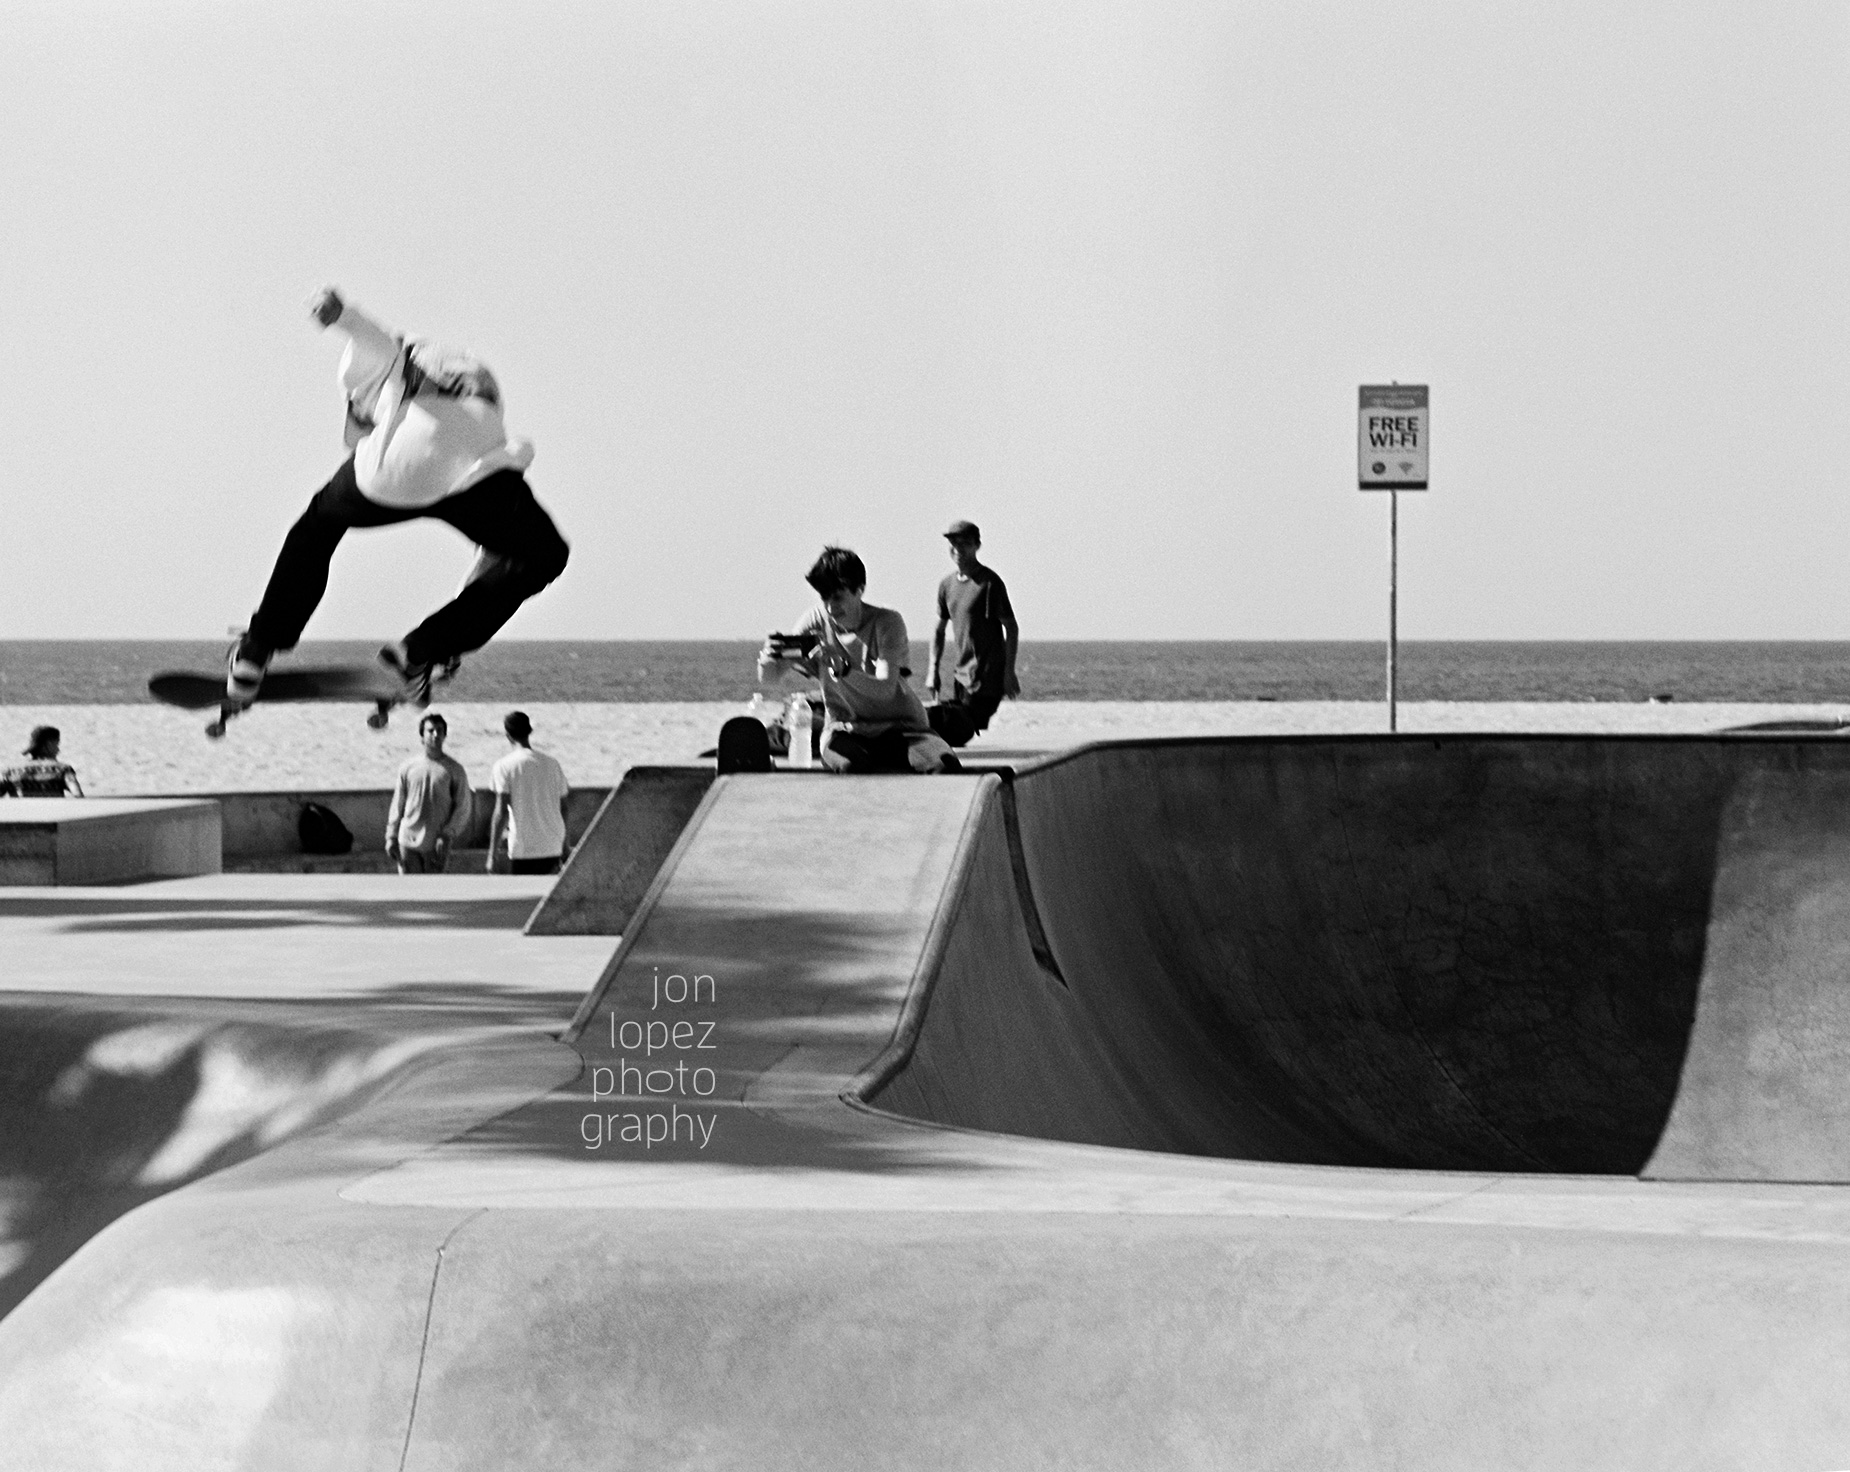 Skateboarding at Venice Beach, CA. Shot on Kodak Tri-X 400.